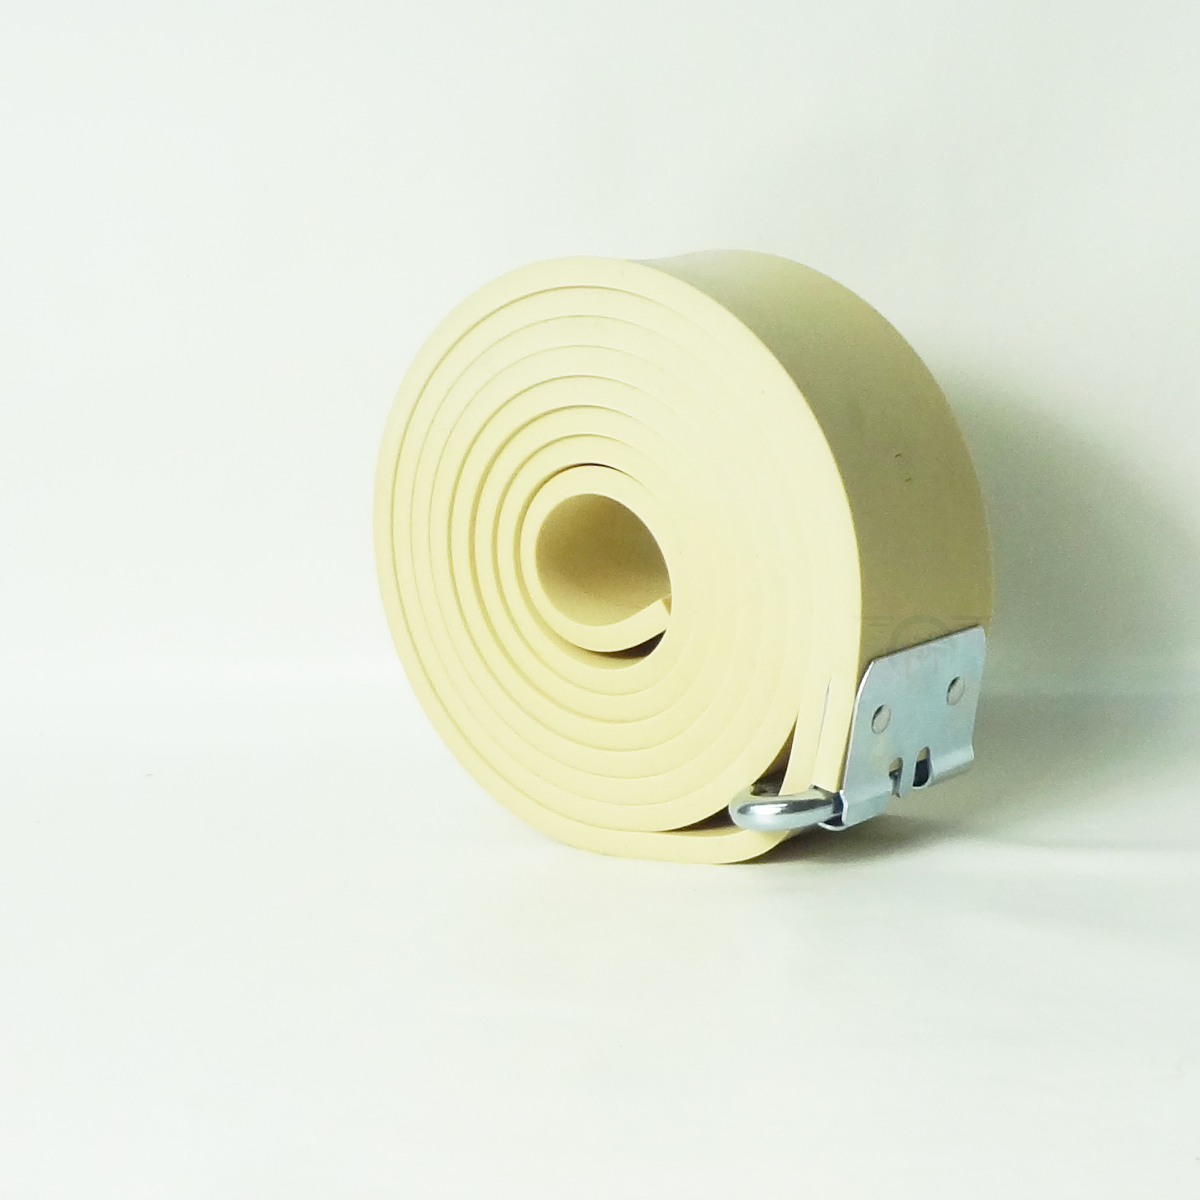 "Ammco Brake Lathe >> Ammco ® 5280 Brake Lathe Drum Silencer Band 1-3/4"" premium and adjustable belt"